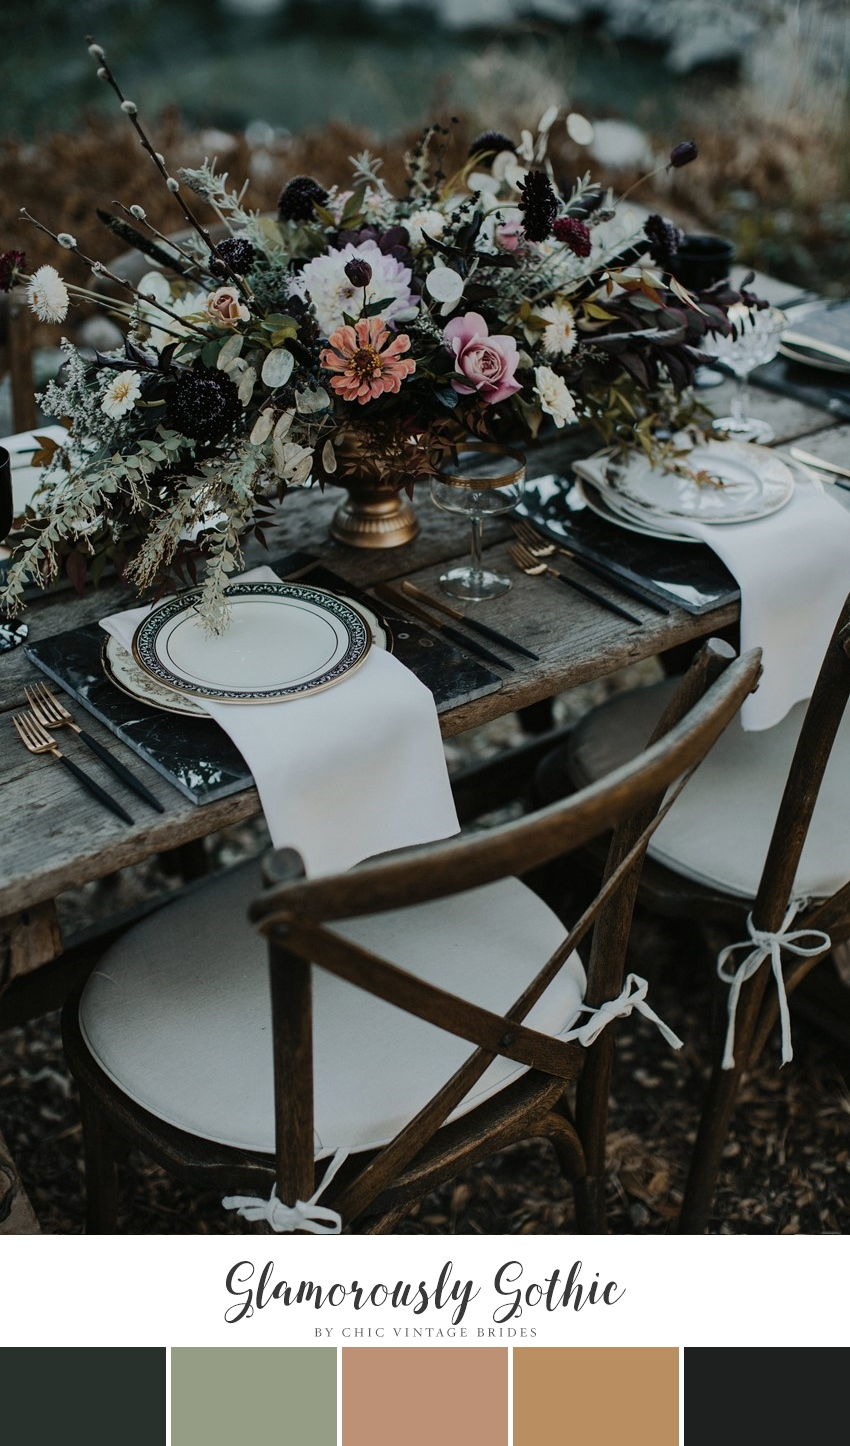 Glamorously Gothic Winter Wedding Colour Palette